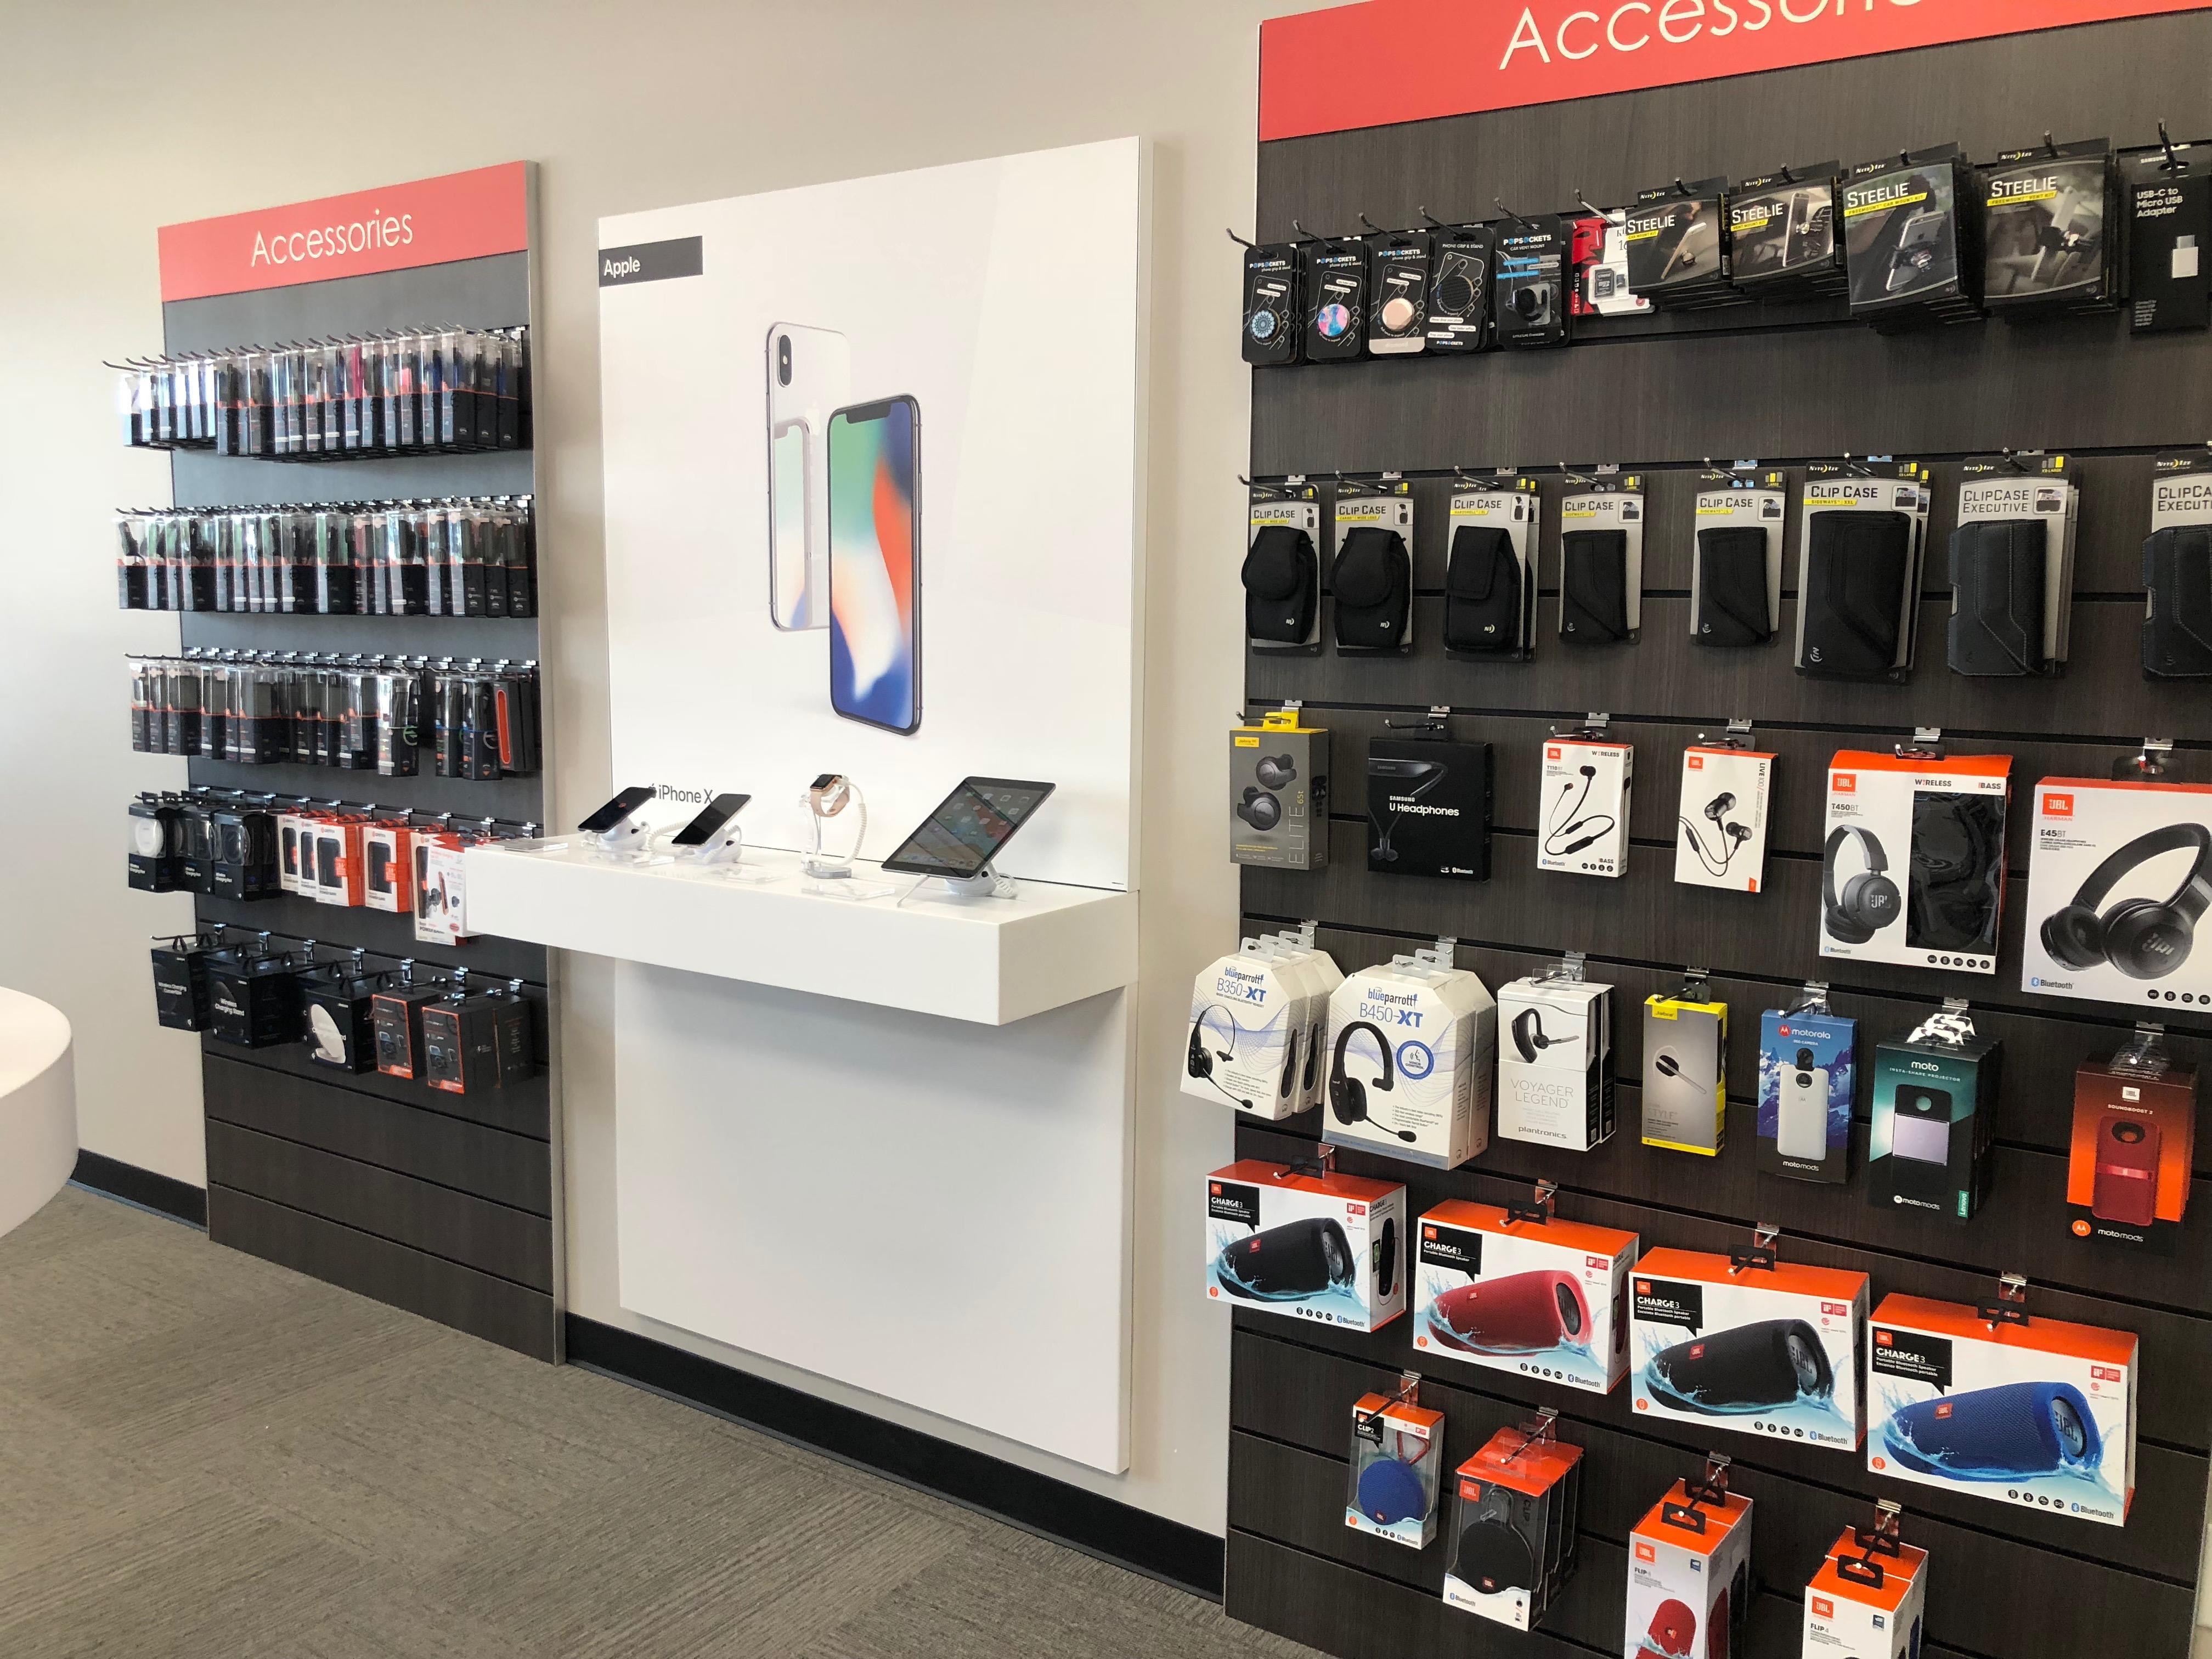 Wireless World - Verizon Authorized Retailer - Worthington, MN 56187 - (507)295-0039 | ShowMeLocal.com